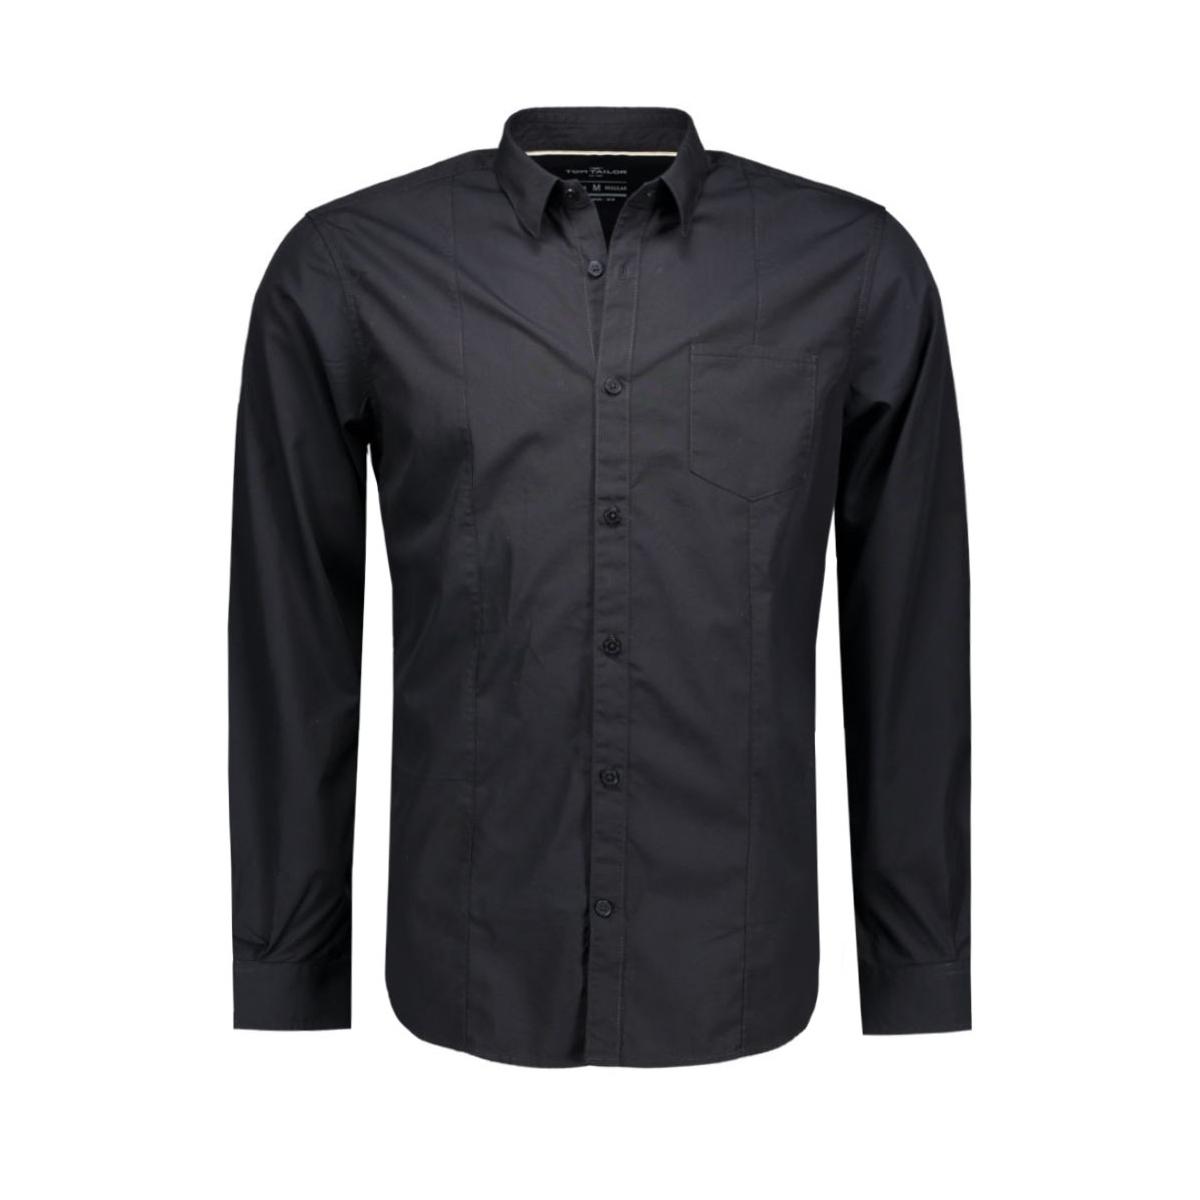 2031470.99.10 tom tailor overhemd 2999